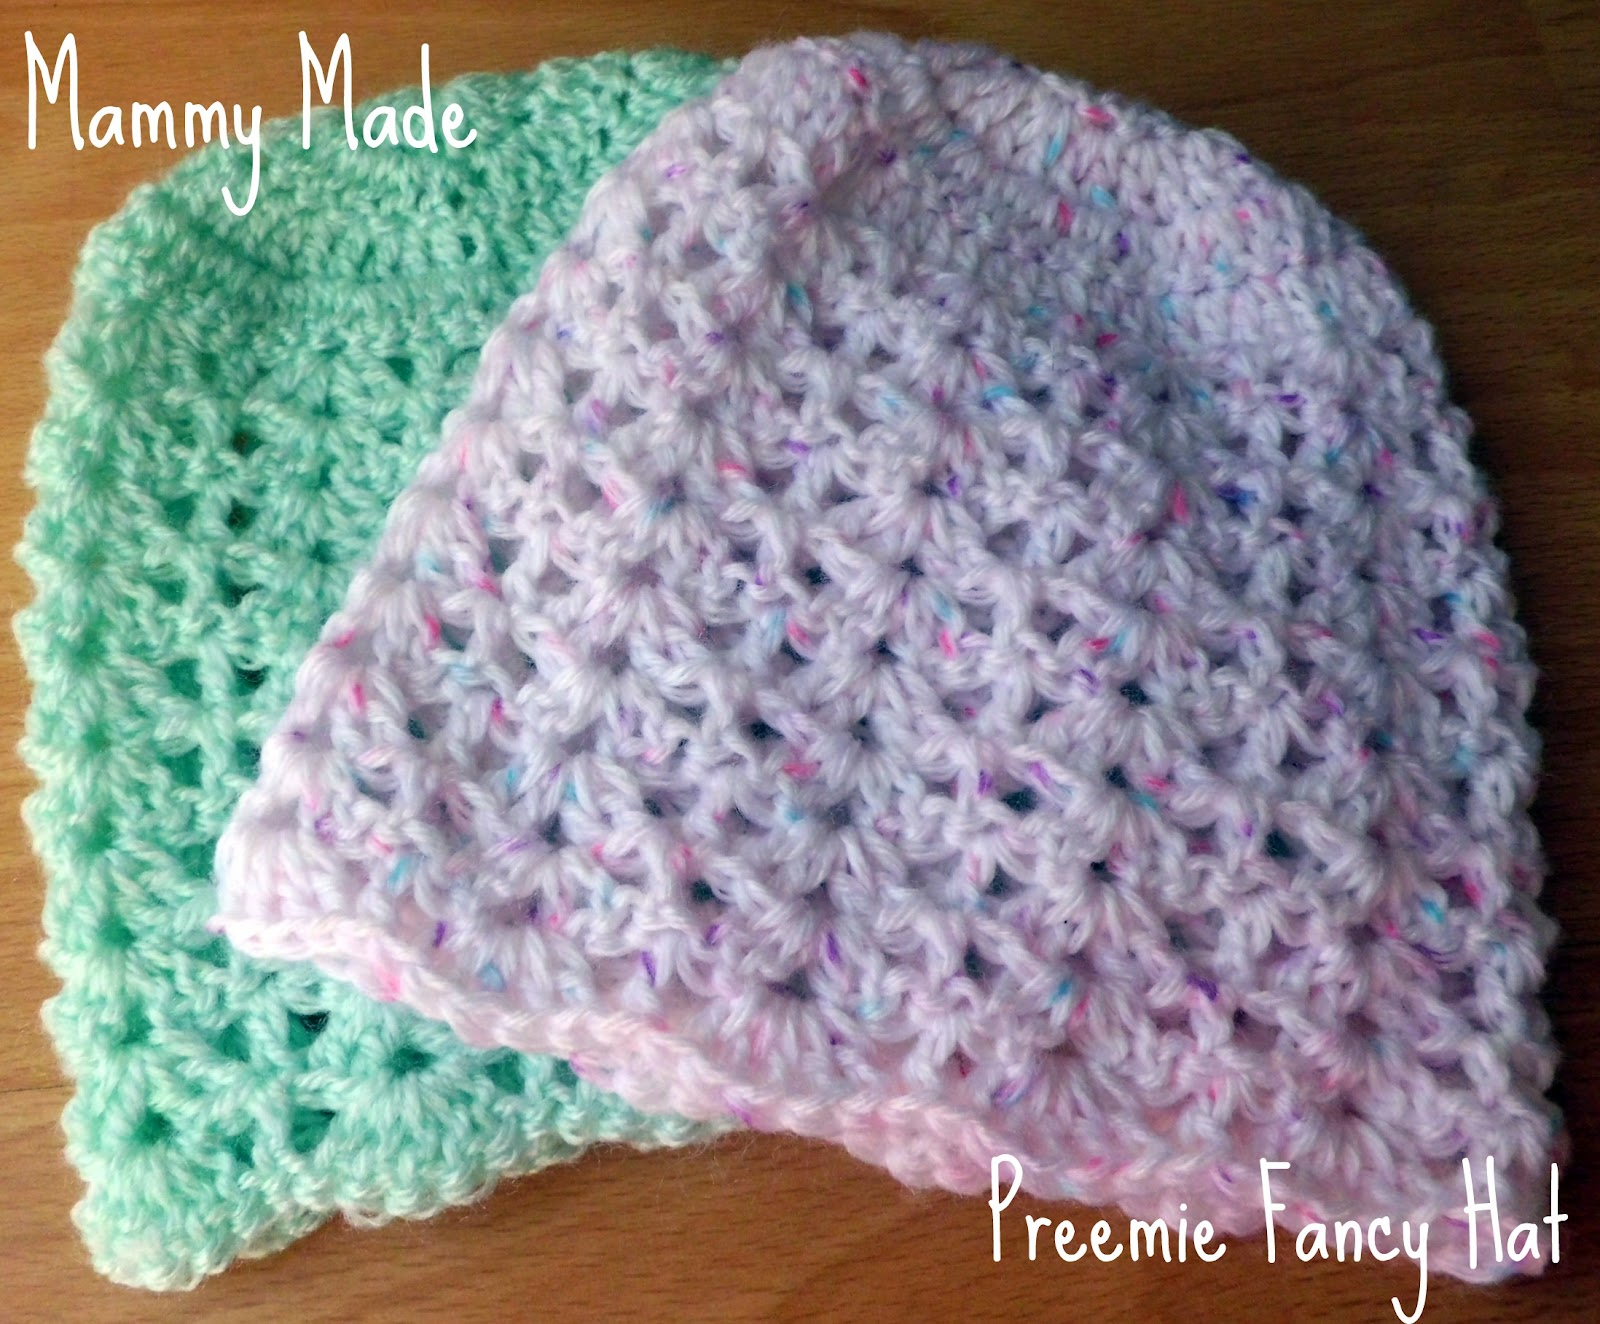 Crochet Hat Pattern For Premature Baby : Mammy Made: Preemie/newborn fancy hat